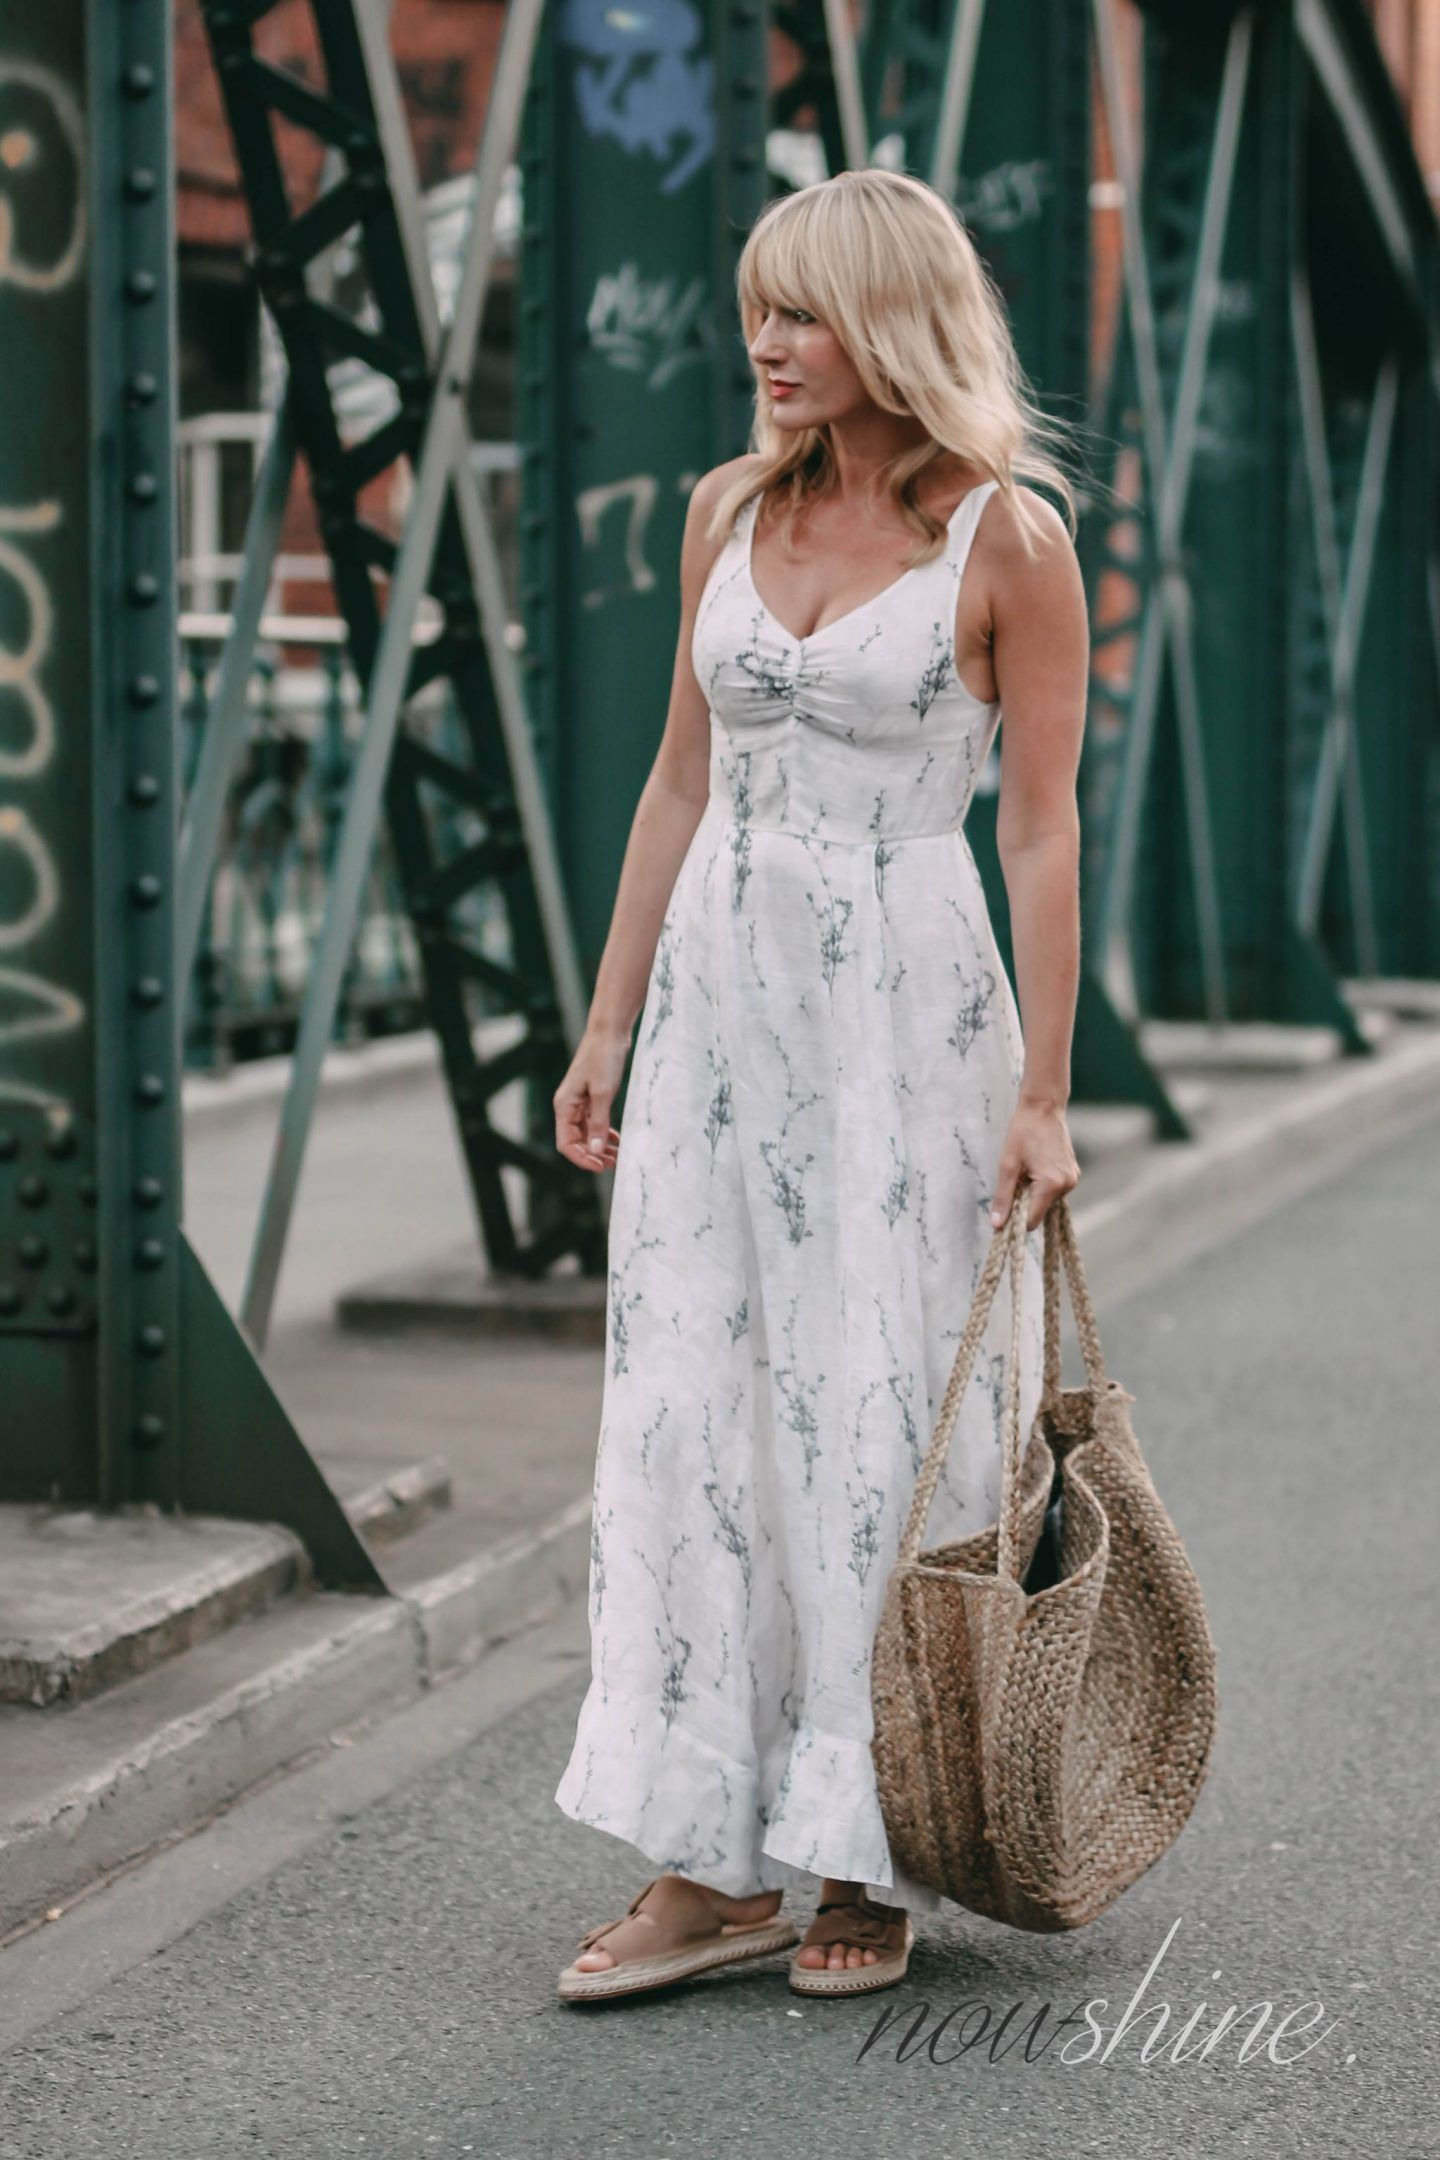 Mode Über 40 Over 40 Fashion Ü40 Blogger Conscious